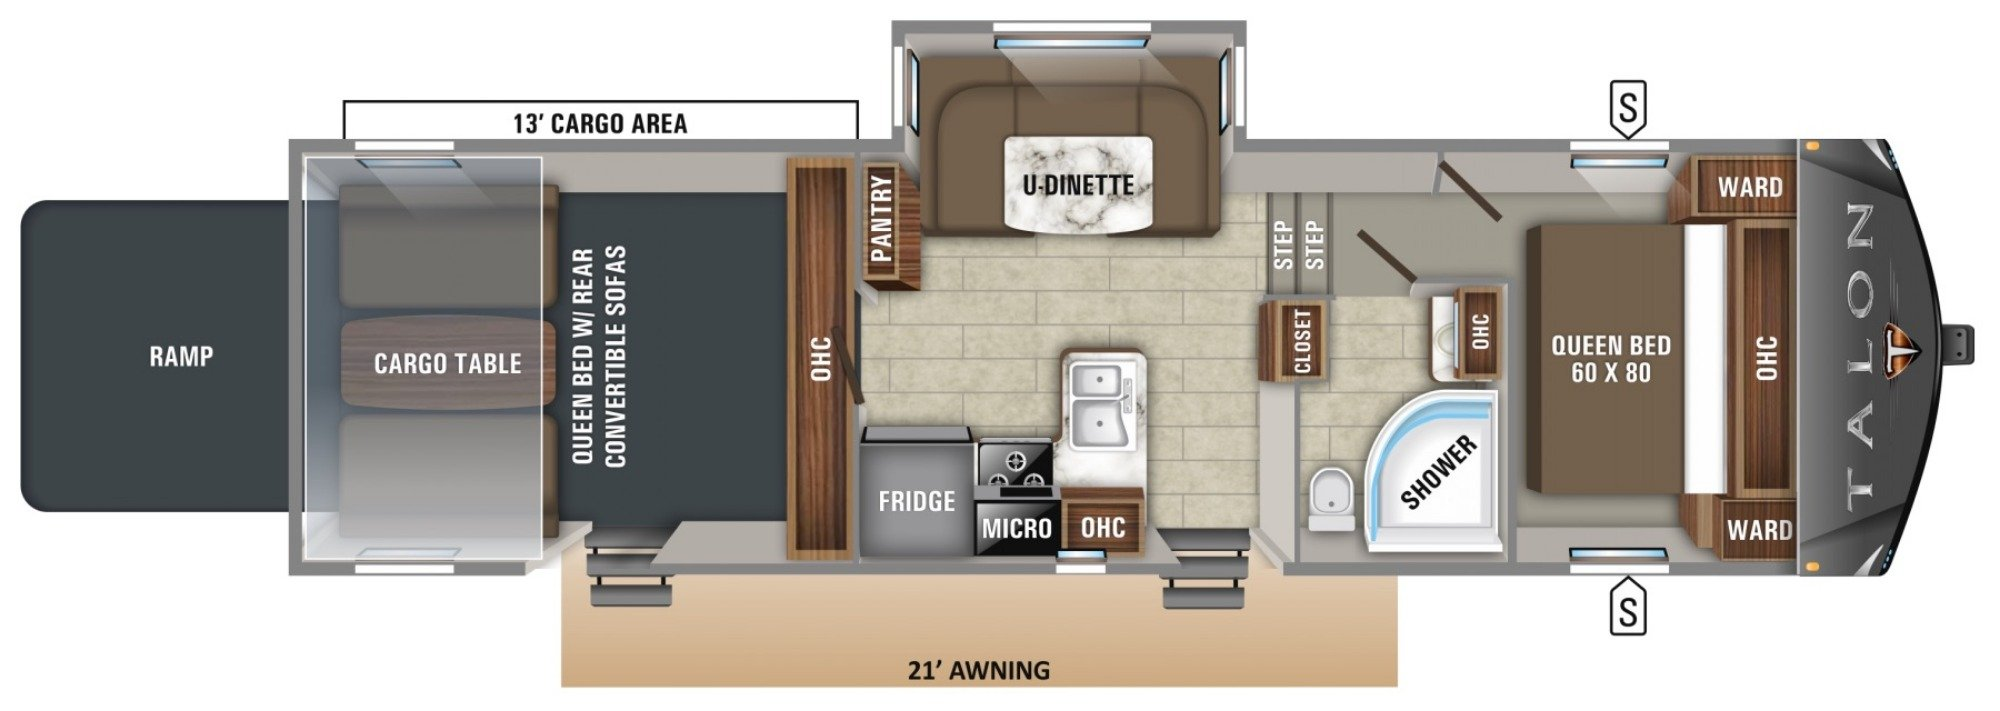 View Floor Plan for 2019 JAYCO TALON 313T